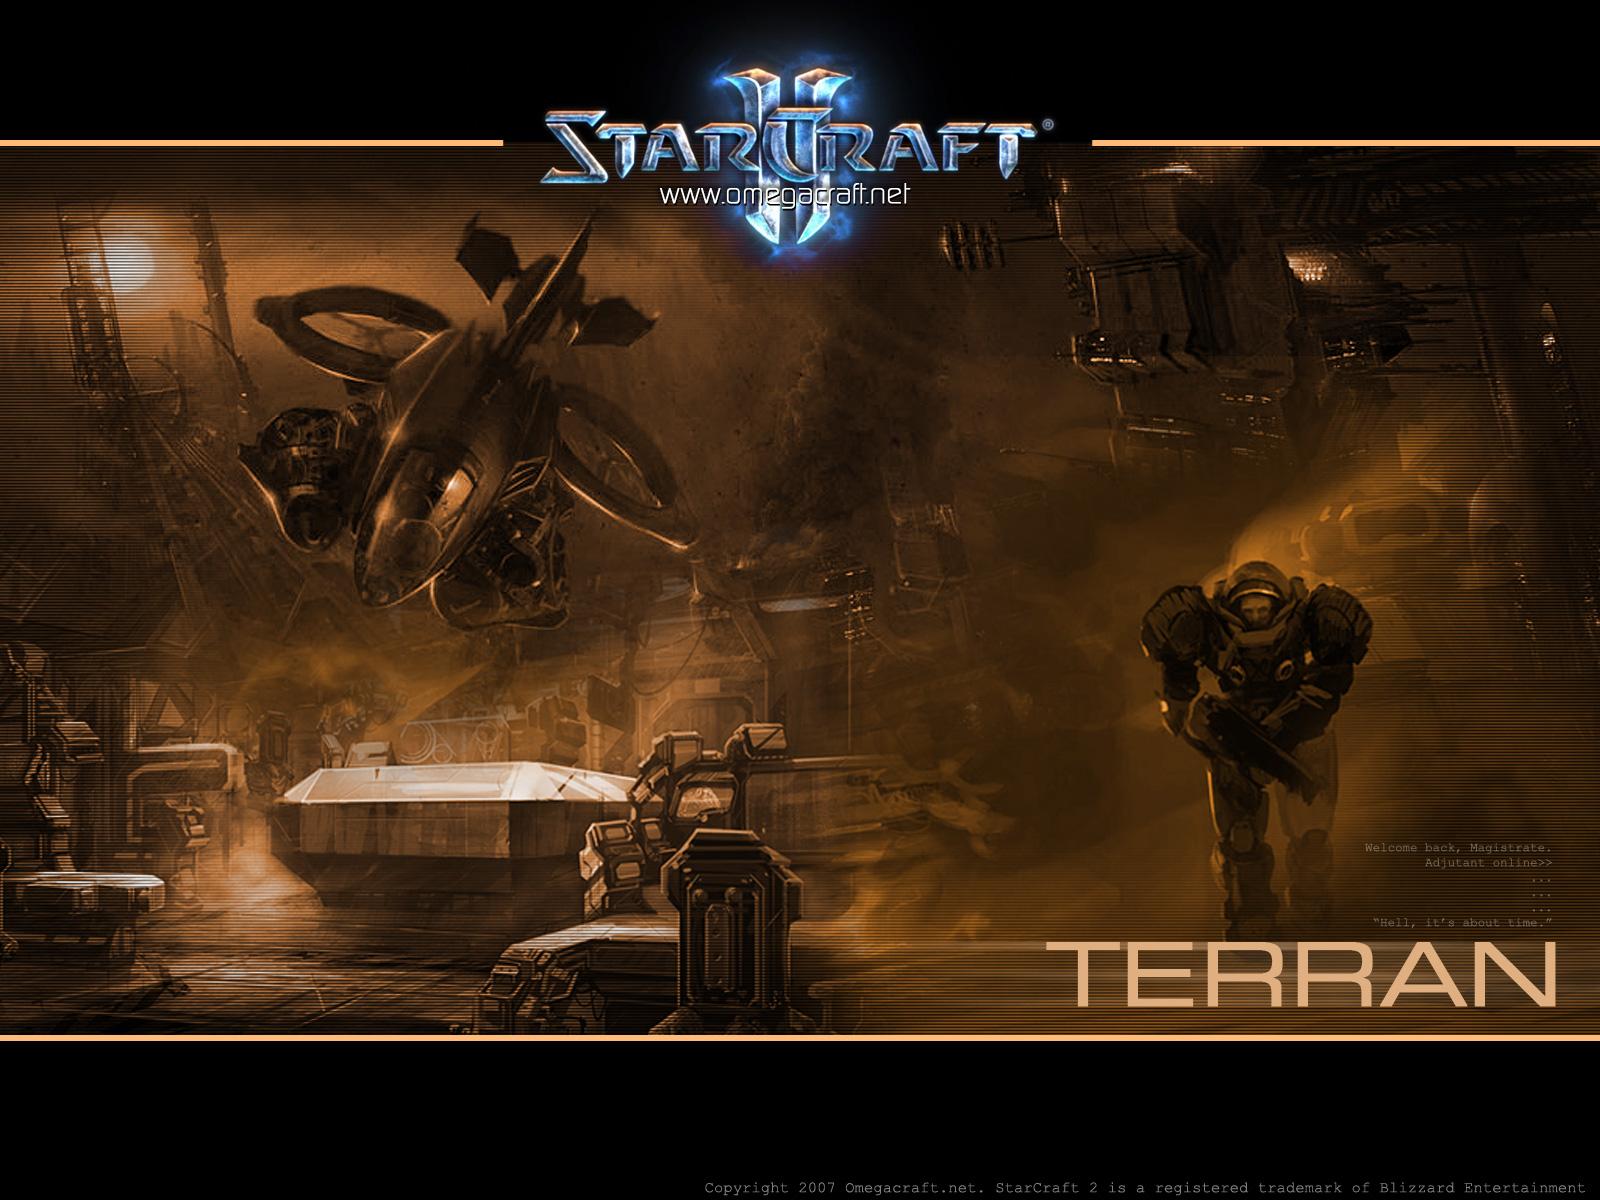 http://2.bp.blogspot.com/_D1Y7HP6eX8U/TOcM-uAO65I/AAAAAAAAAak/6V3W1cKShos/s1600/Starcraft+2+terran+wallpaper.jpg